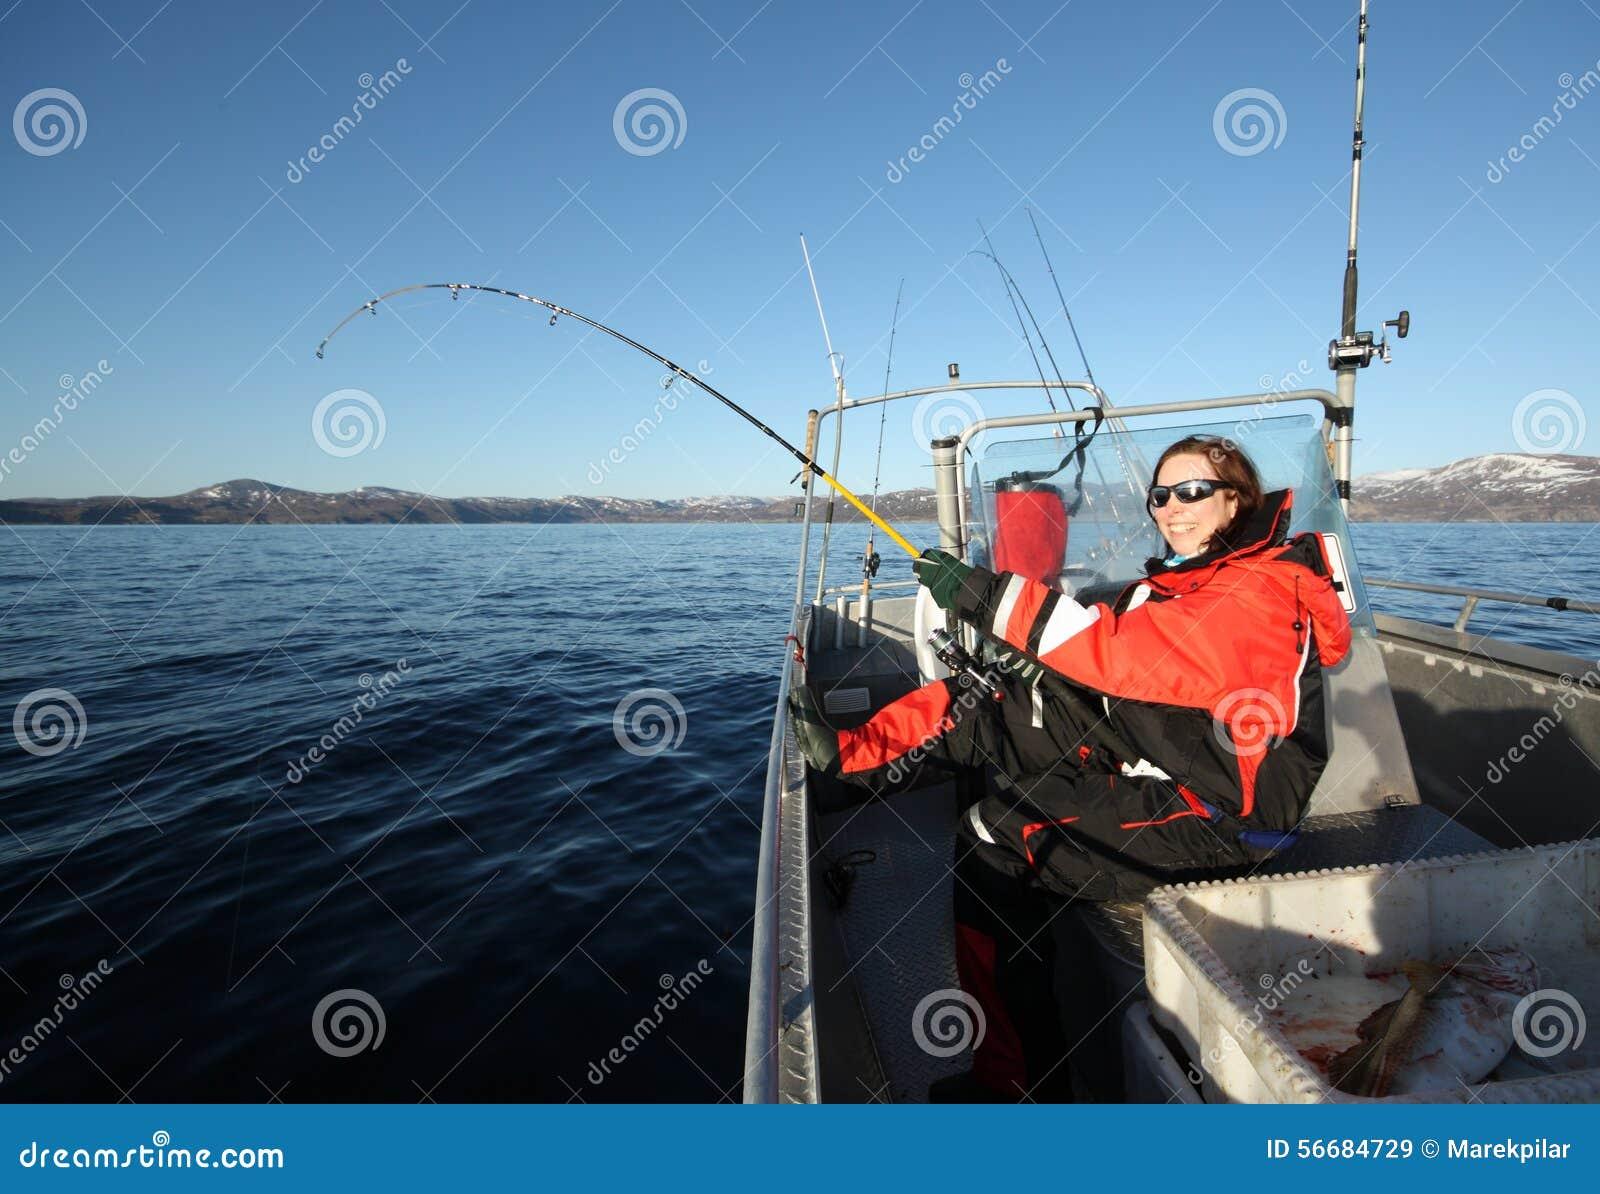 Man And Woman Fishing Catfish Stock Photography ...